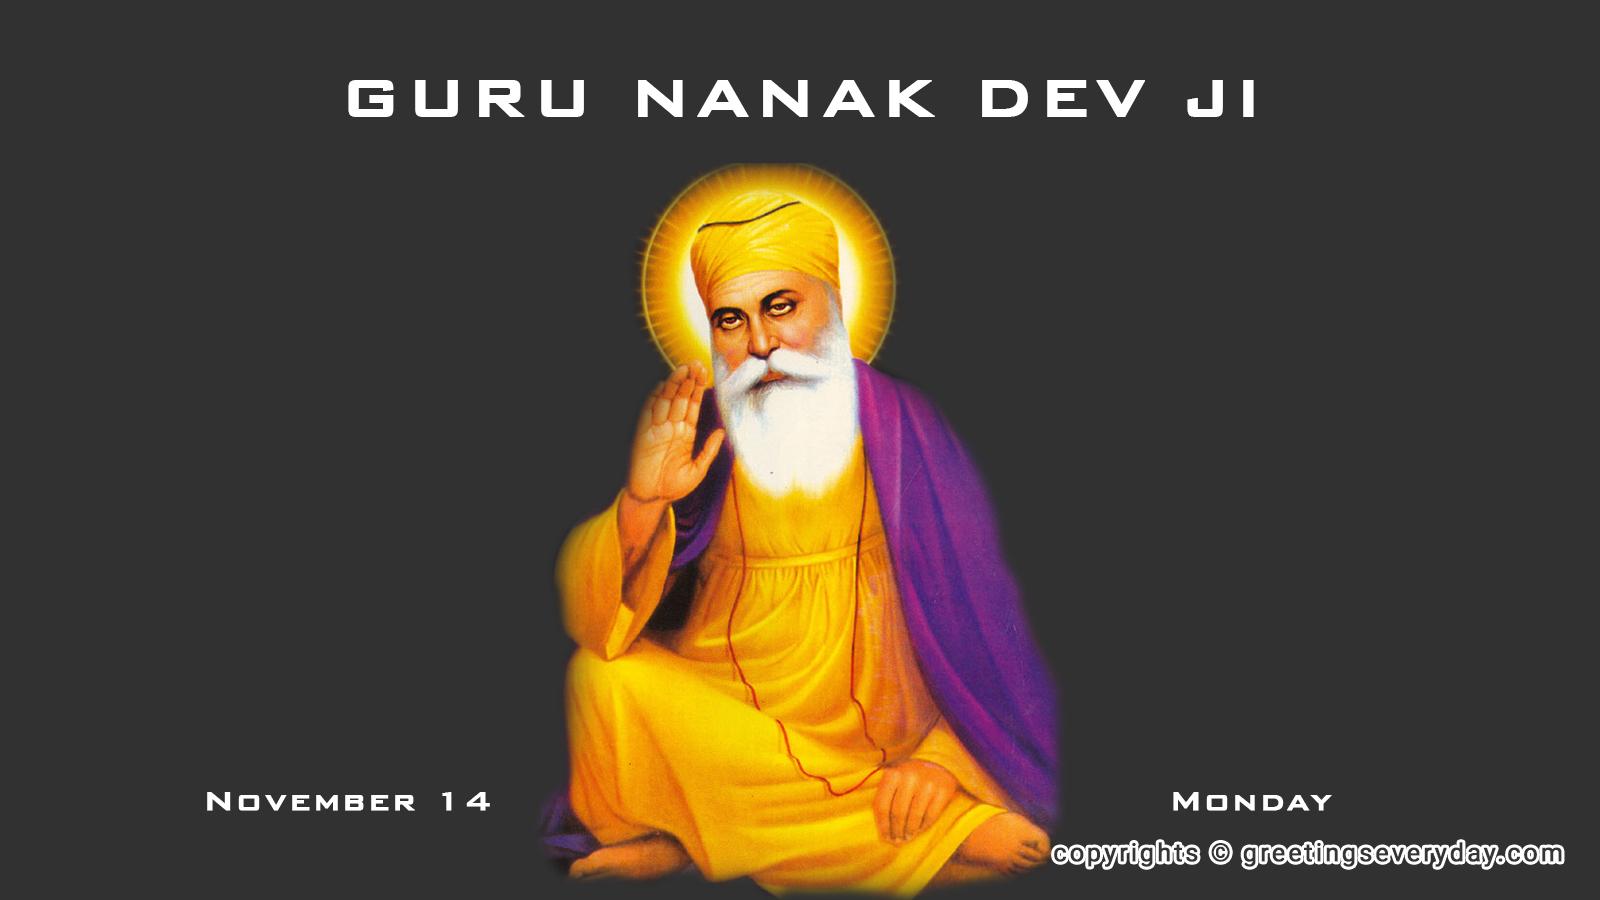 guru nanak jayanti Gurunanak jayanti also known as gurpurab (sikh guru nanak birthday) will be celebrated on 23rd november in 2018 more information on guru nanak jayanti.